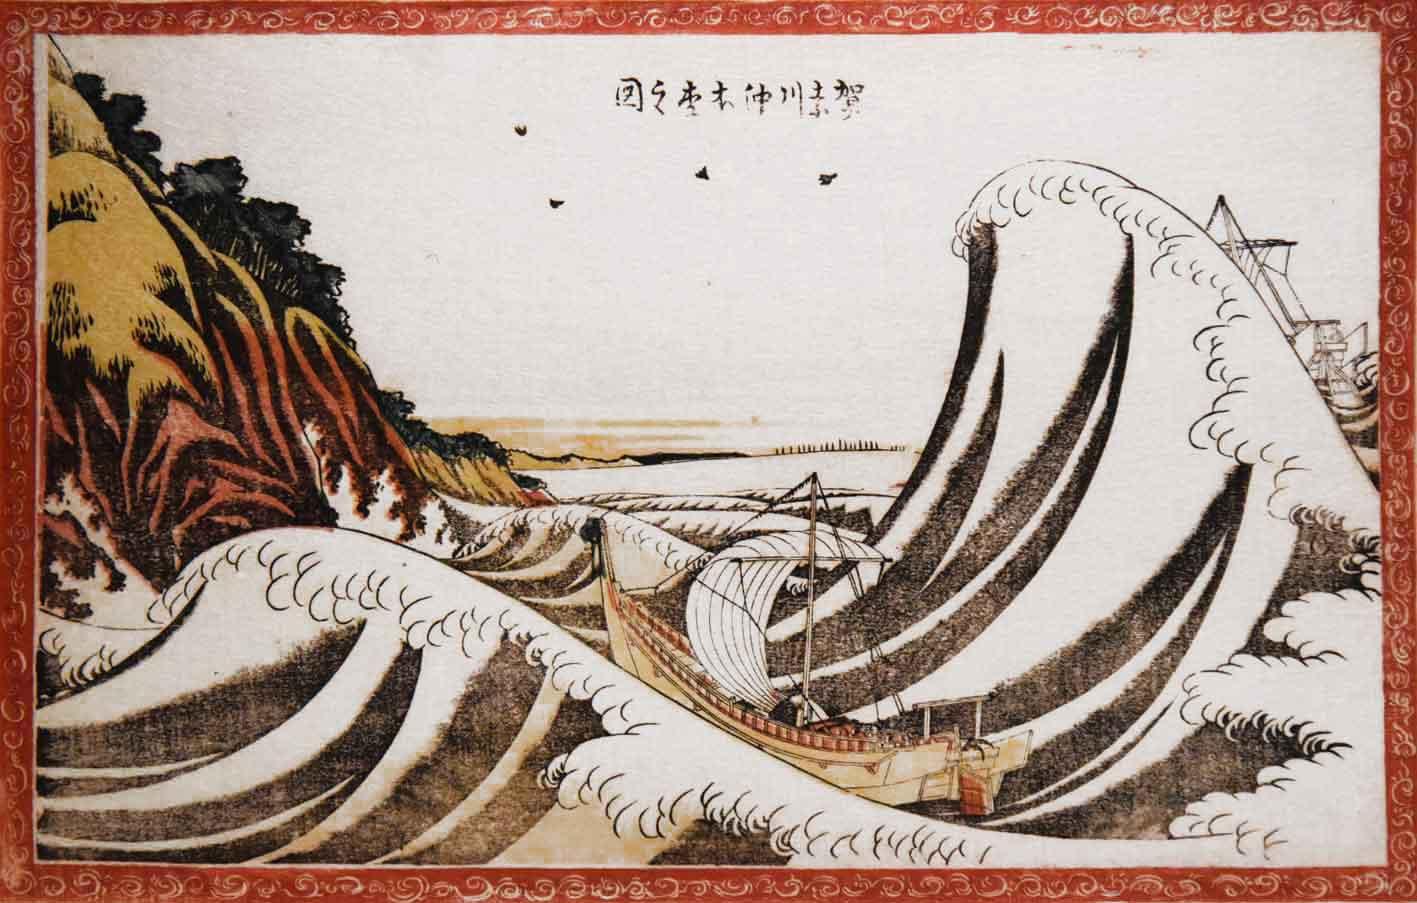 Honmoku Off the Coast of Kanagawa, Woodblock Print by Katsushika Hokusai